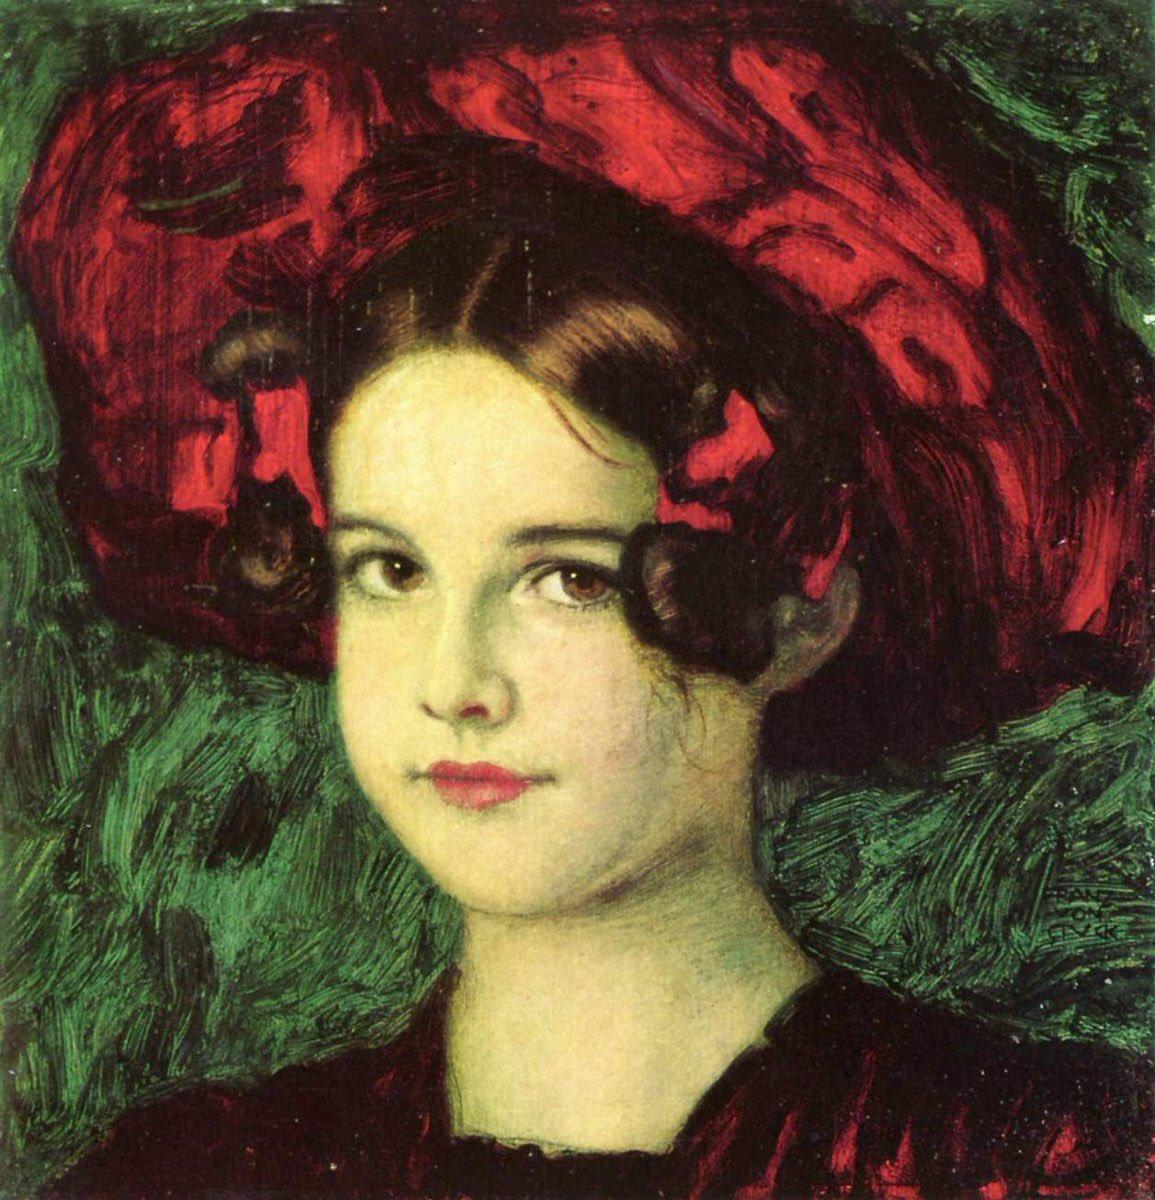 Franz Von Stuck, ''Kırmızı Şapkalı Mary'', 1902.